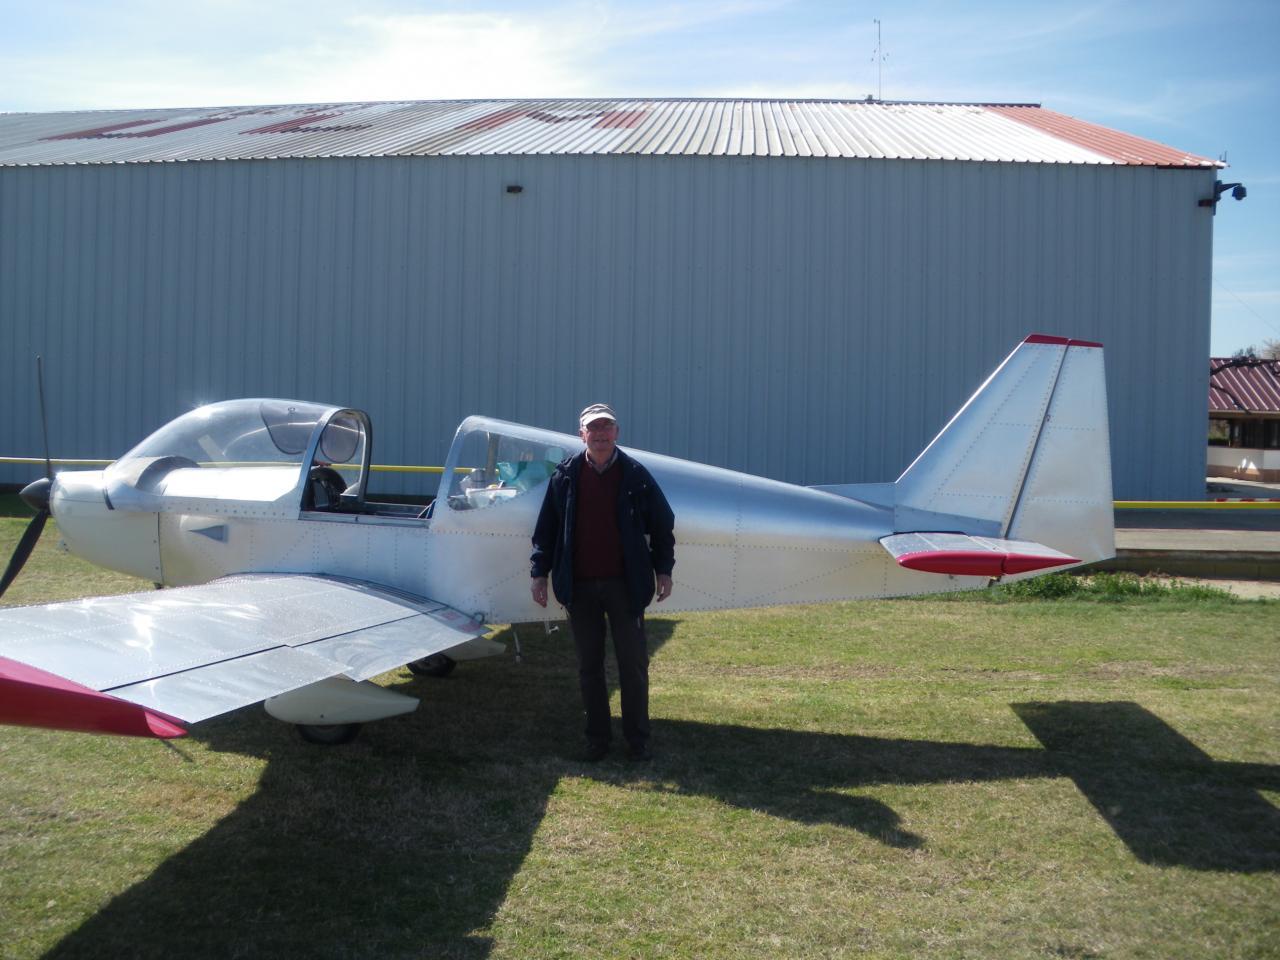 Michel le pilote stratège